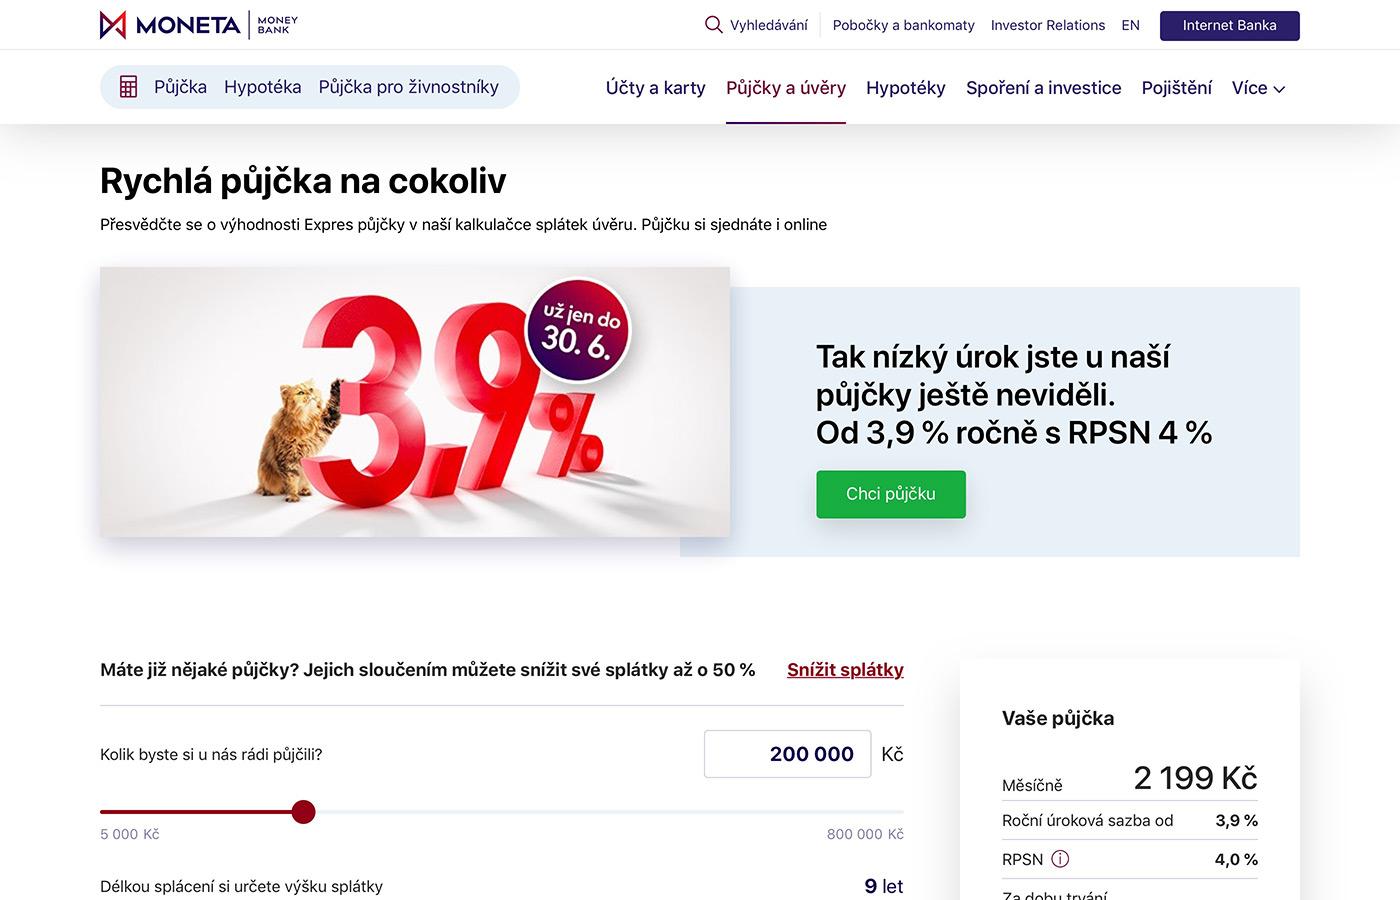 Webové stránky https://www.moneta.cz/pujcky-a-uvery/pujcka-na-cokoliv